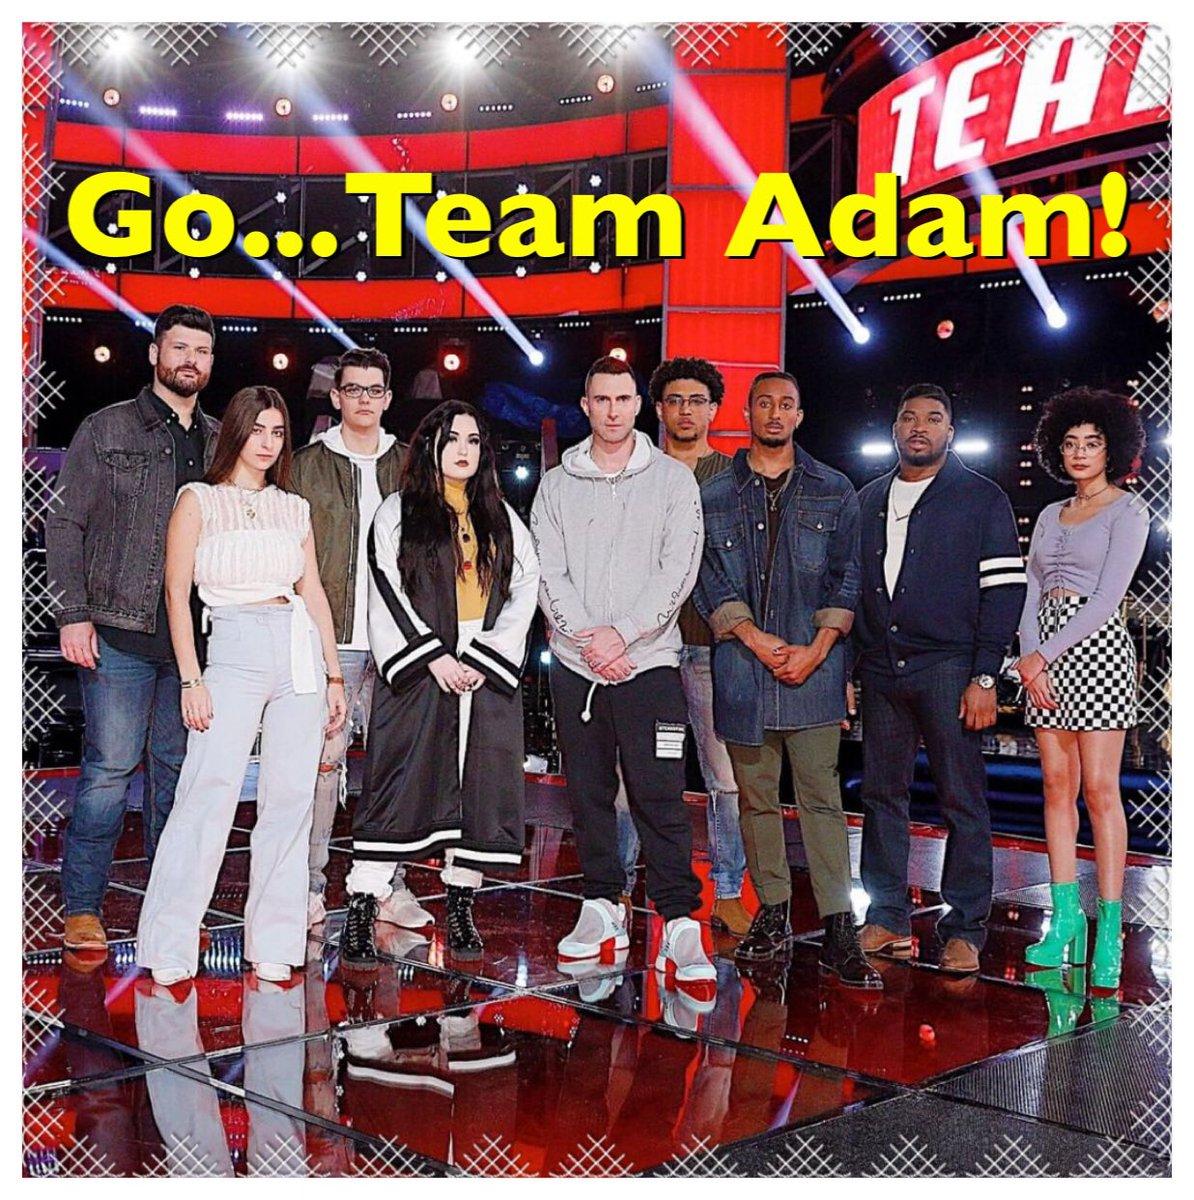 Good luck tonight #TeamAdam!  Looking forward to tonight's live episode of @NBCTheVoice @adamlevine <br>http://pic.twitter.com/L47SvJa5mQ